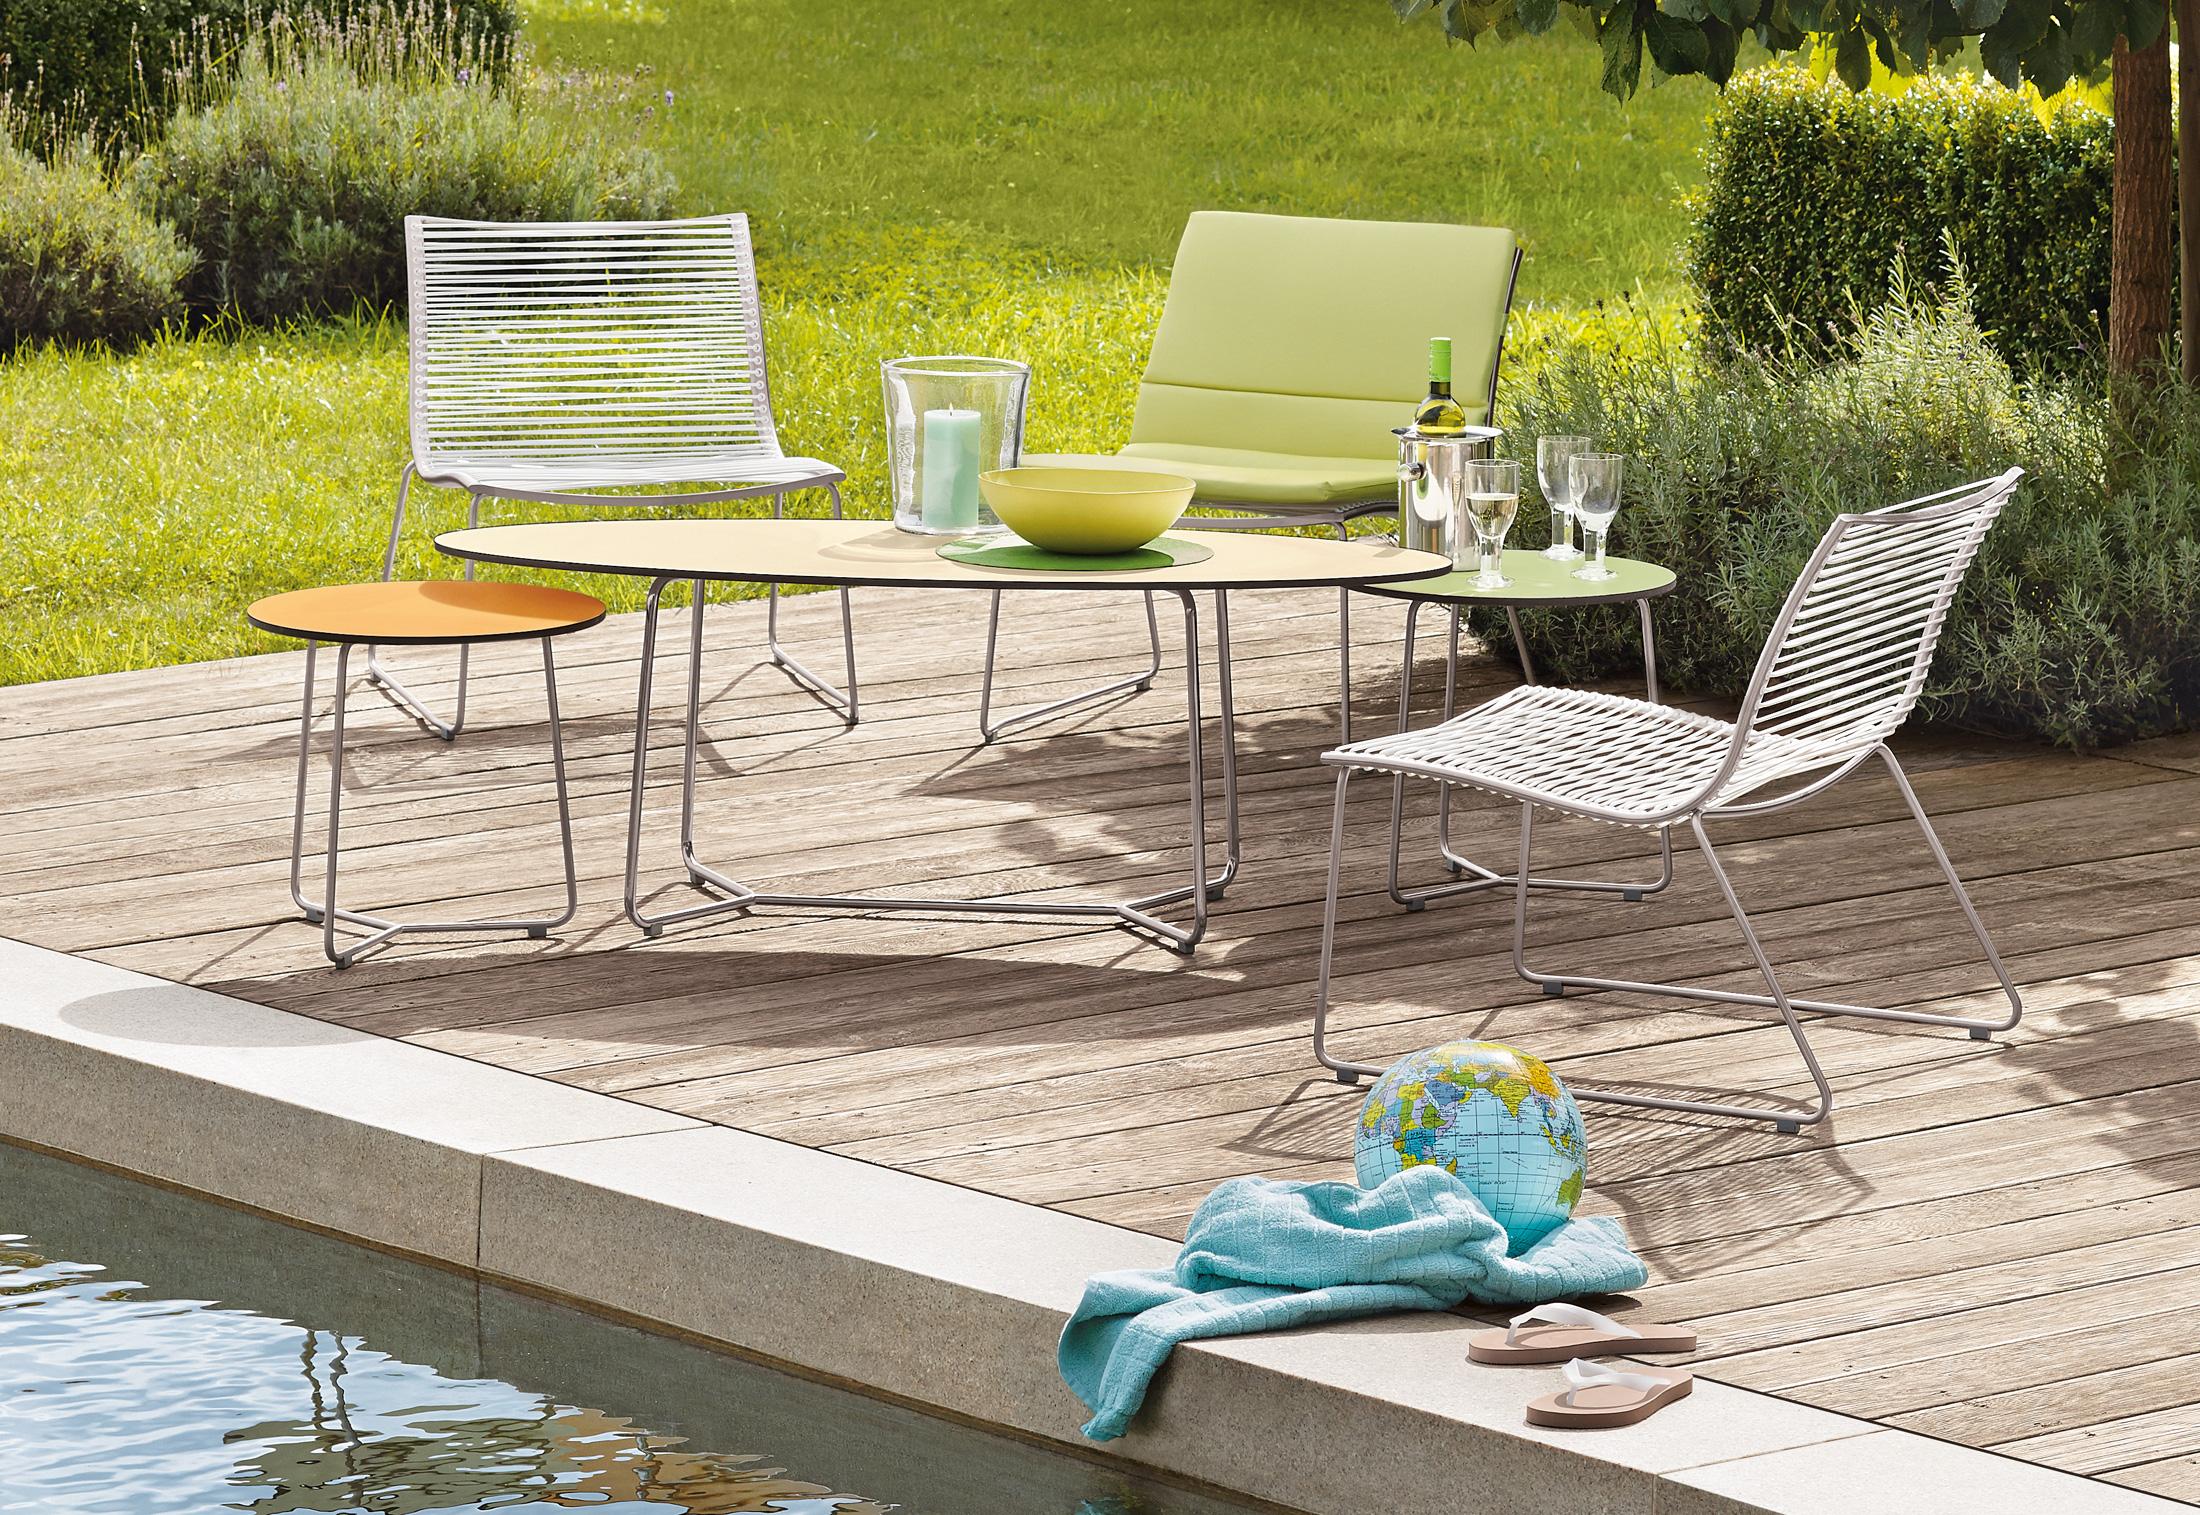 pan sessel von garpa stylepark. Black Bedroom Furniture Sets. Home Design Ideas